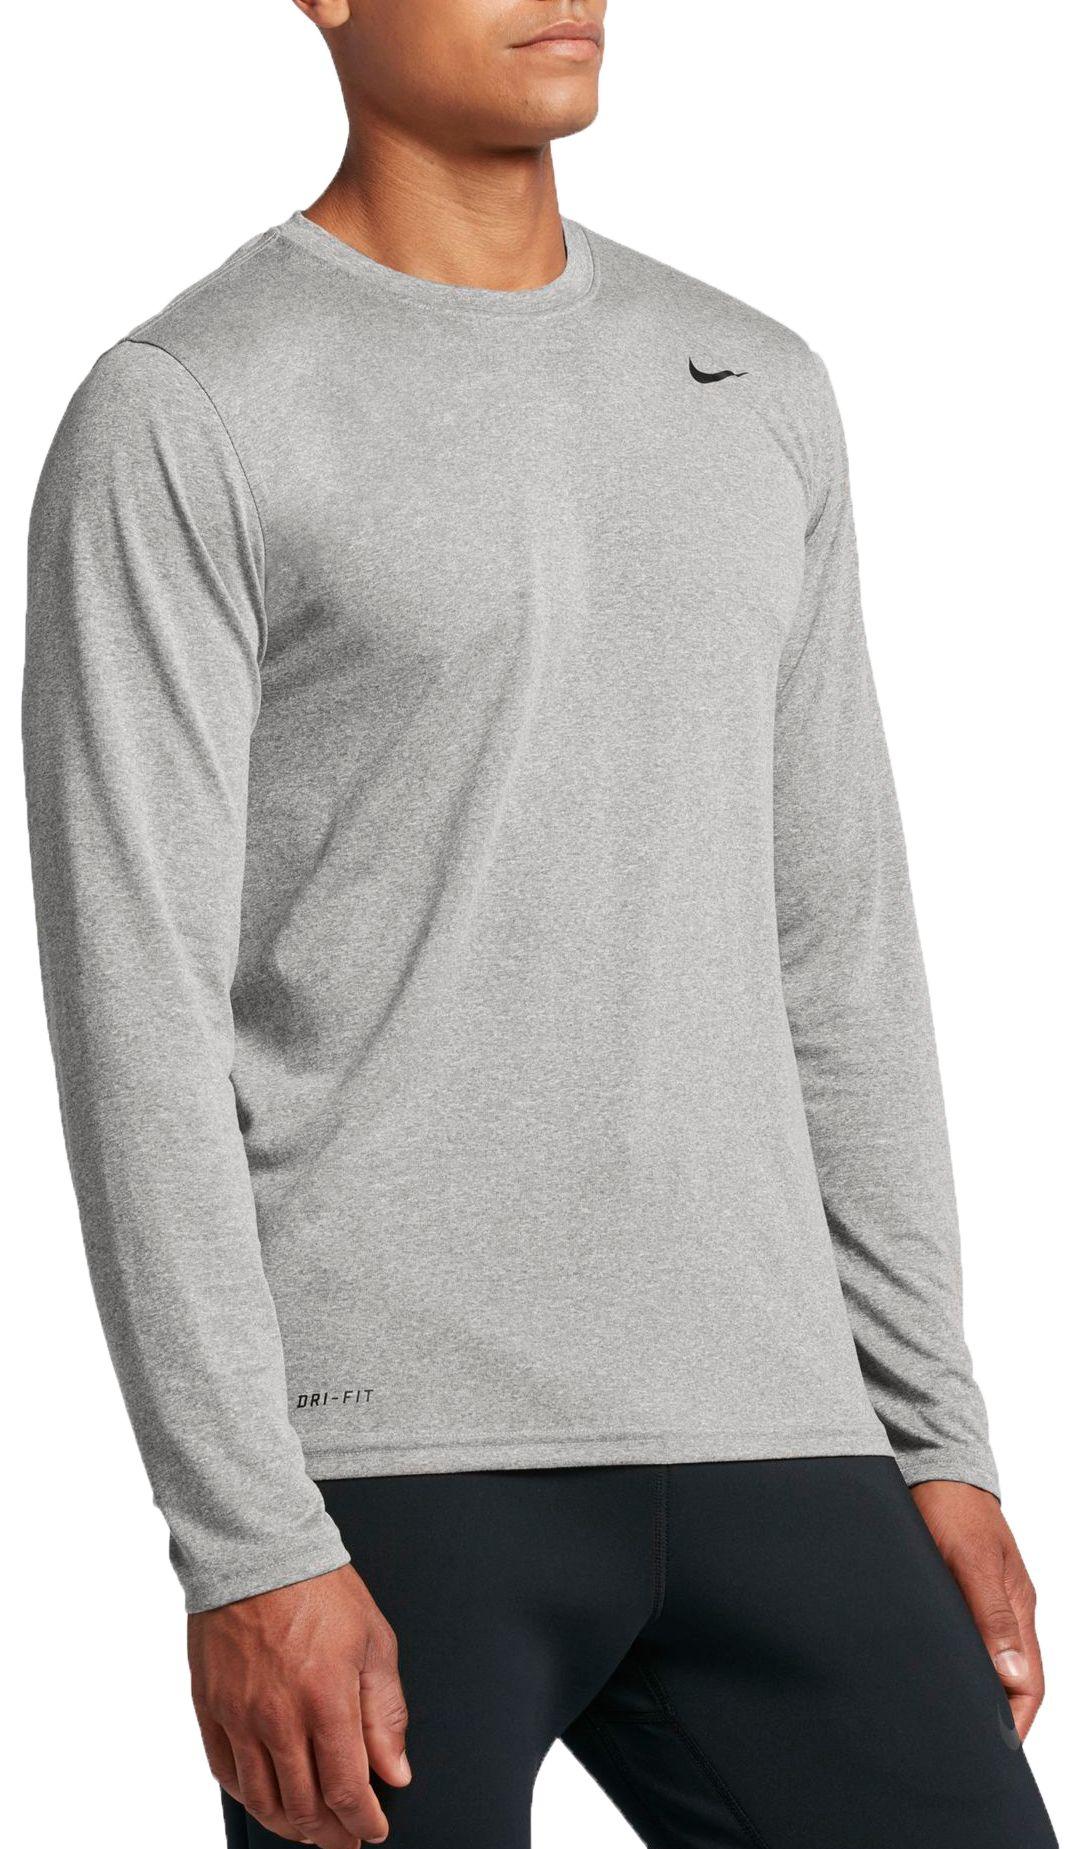 14947219ef4b3 Nike Men's Legend Long Sleeve Shirt